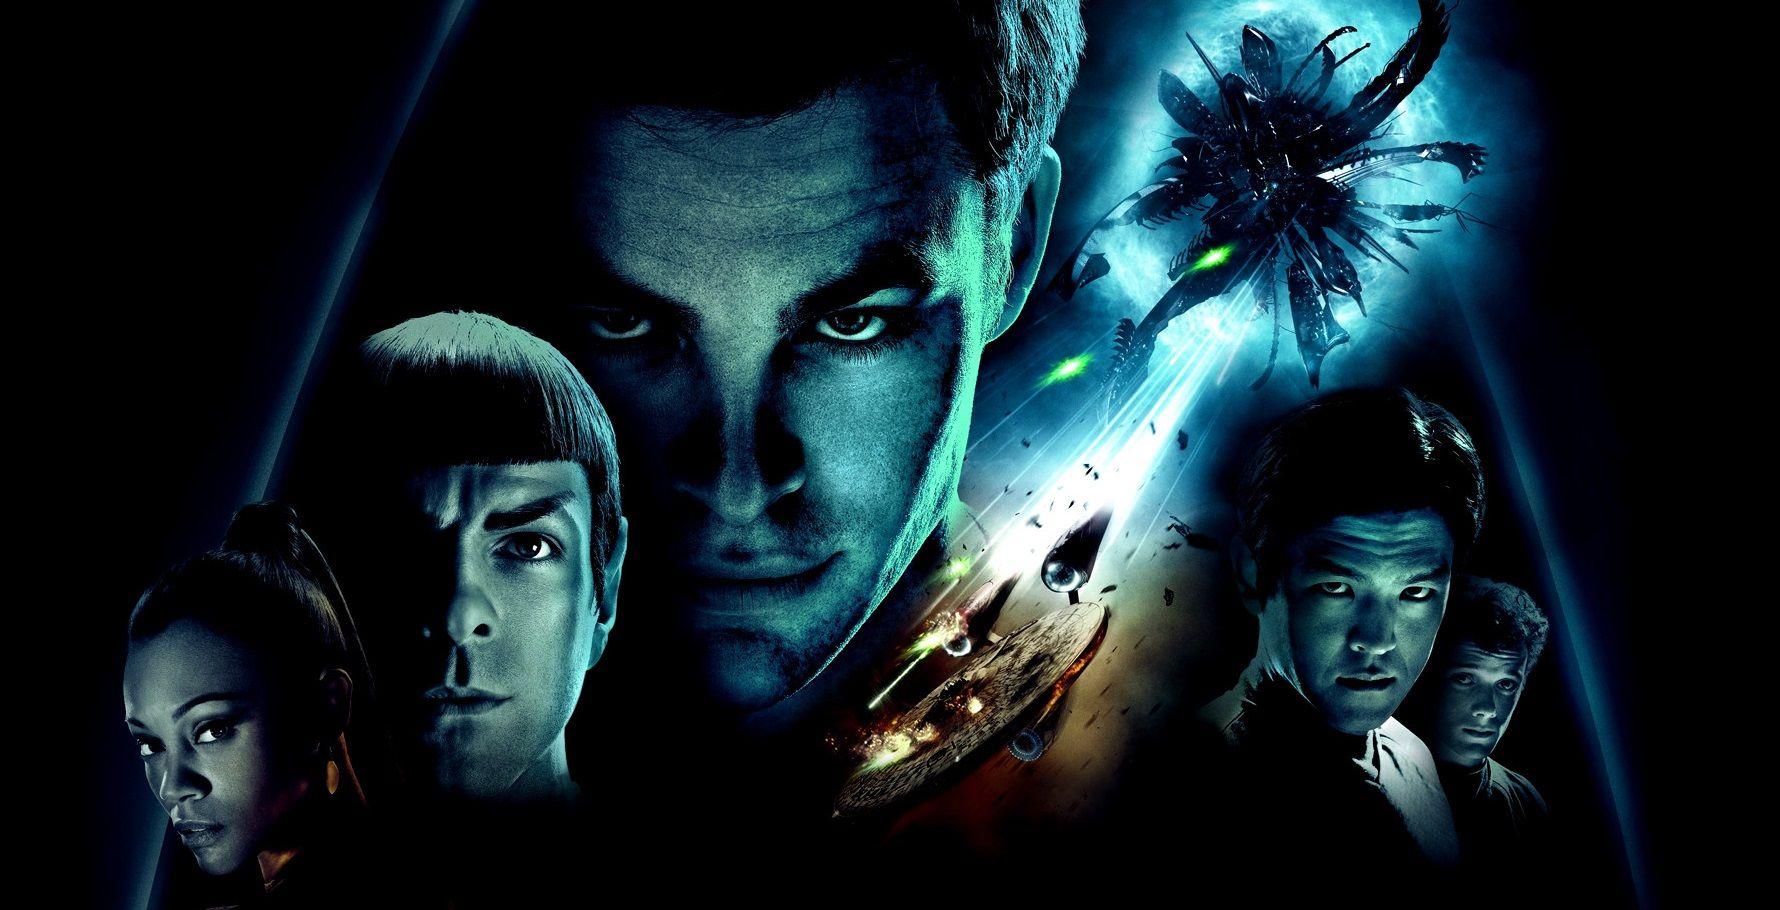 10 Ways J.J. Abrams' Reboot Made Star Trek Better | ScreenRant